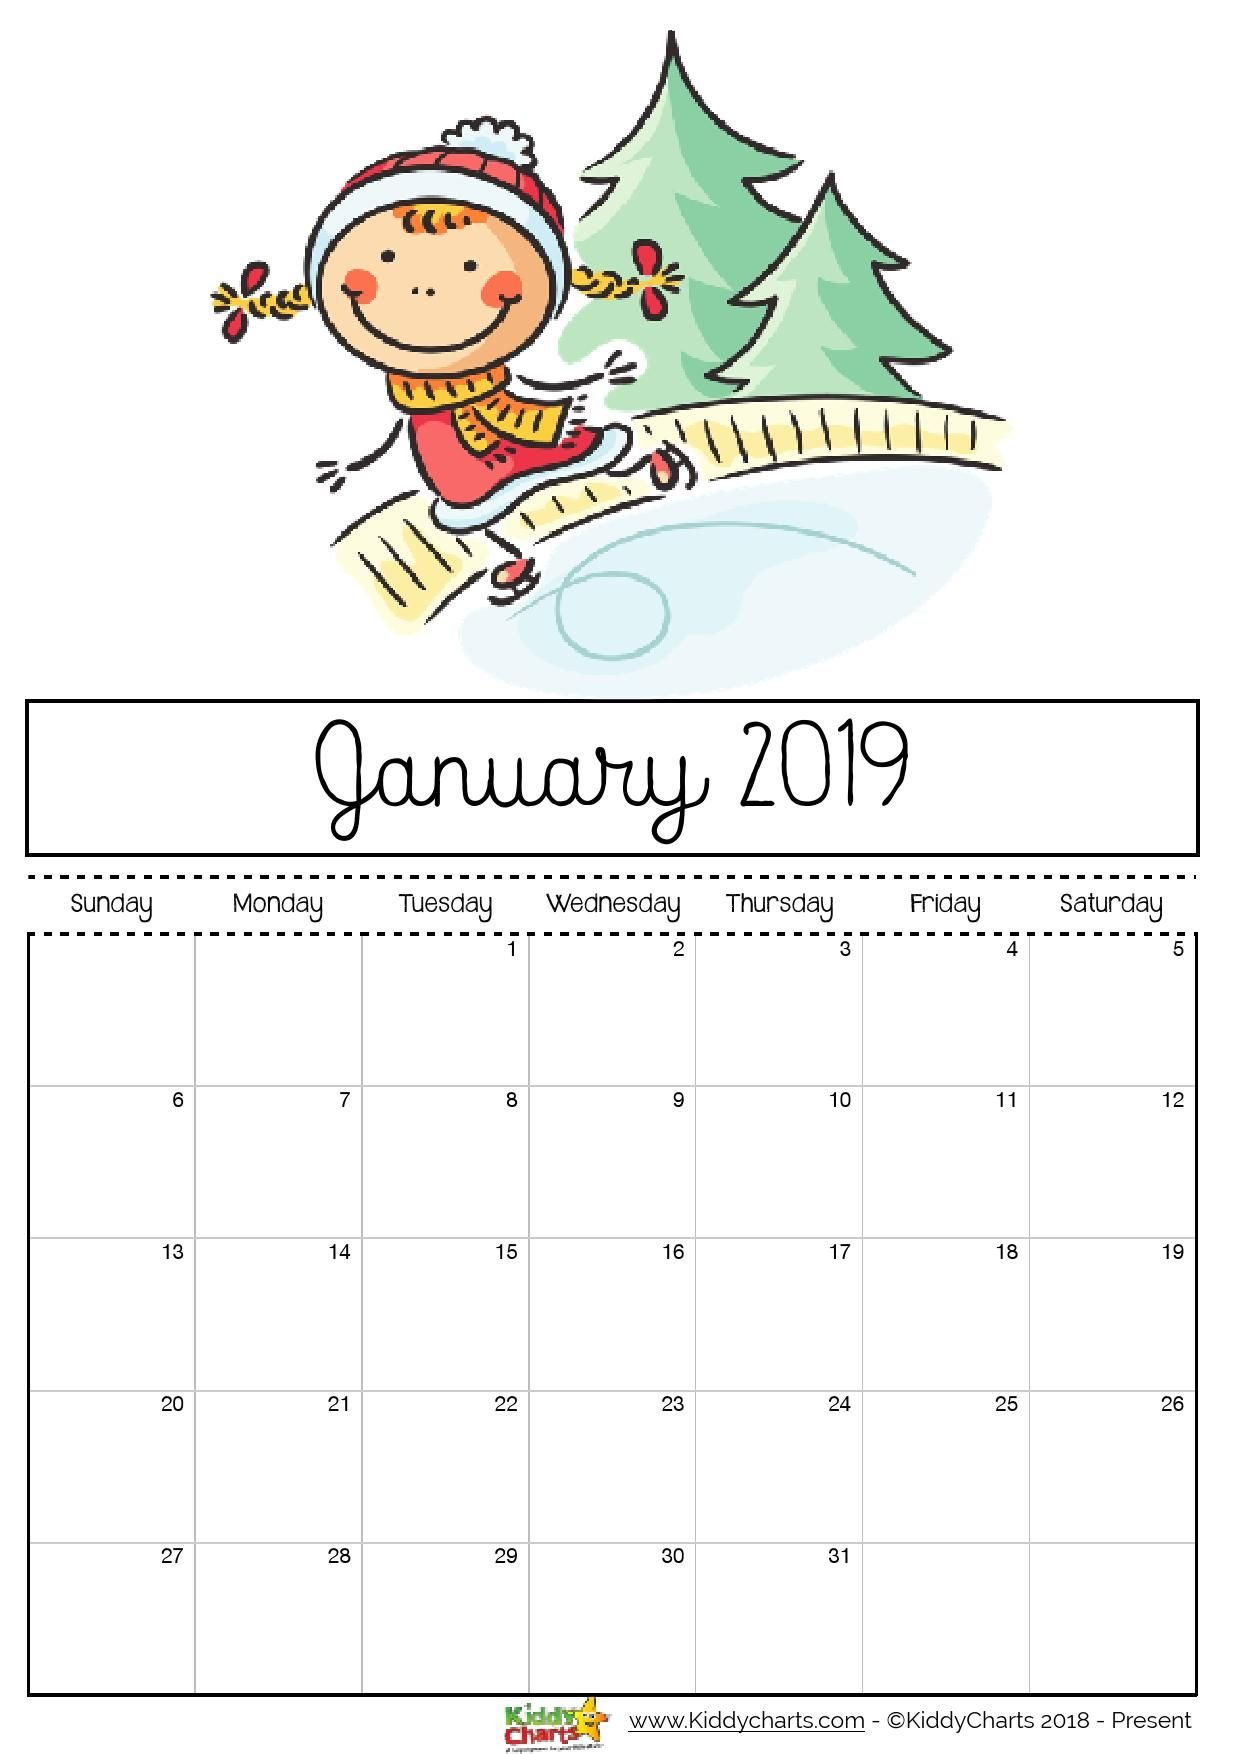 Free Printable 2019 Calendar – Print Yours Here | Planner | Print Calendar 2019 Girly